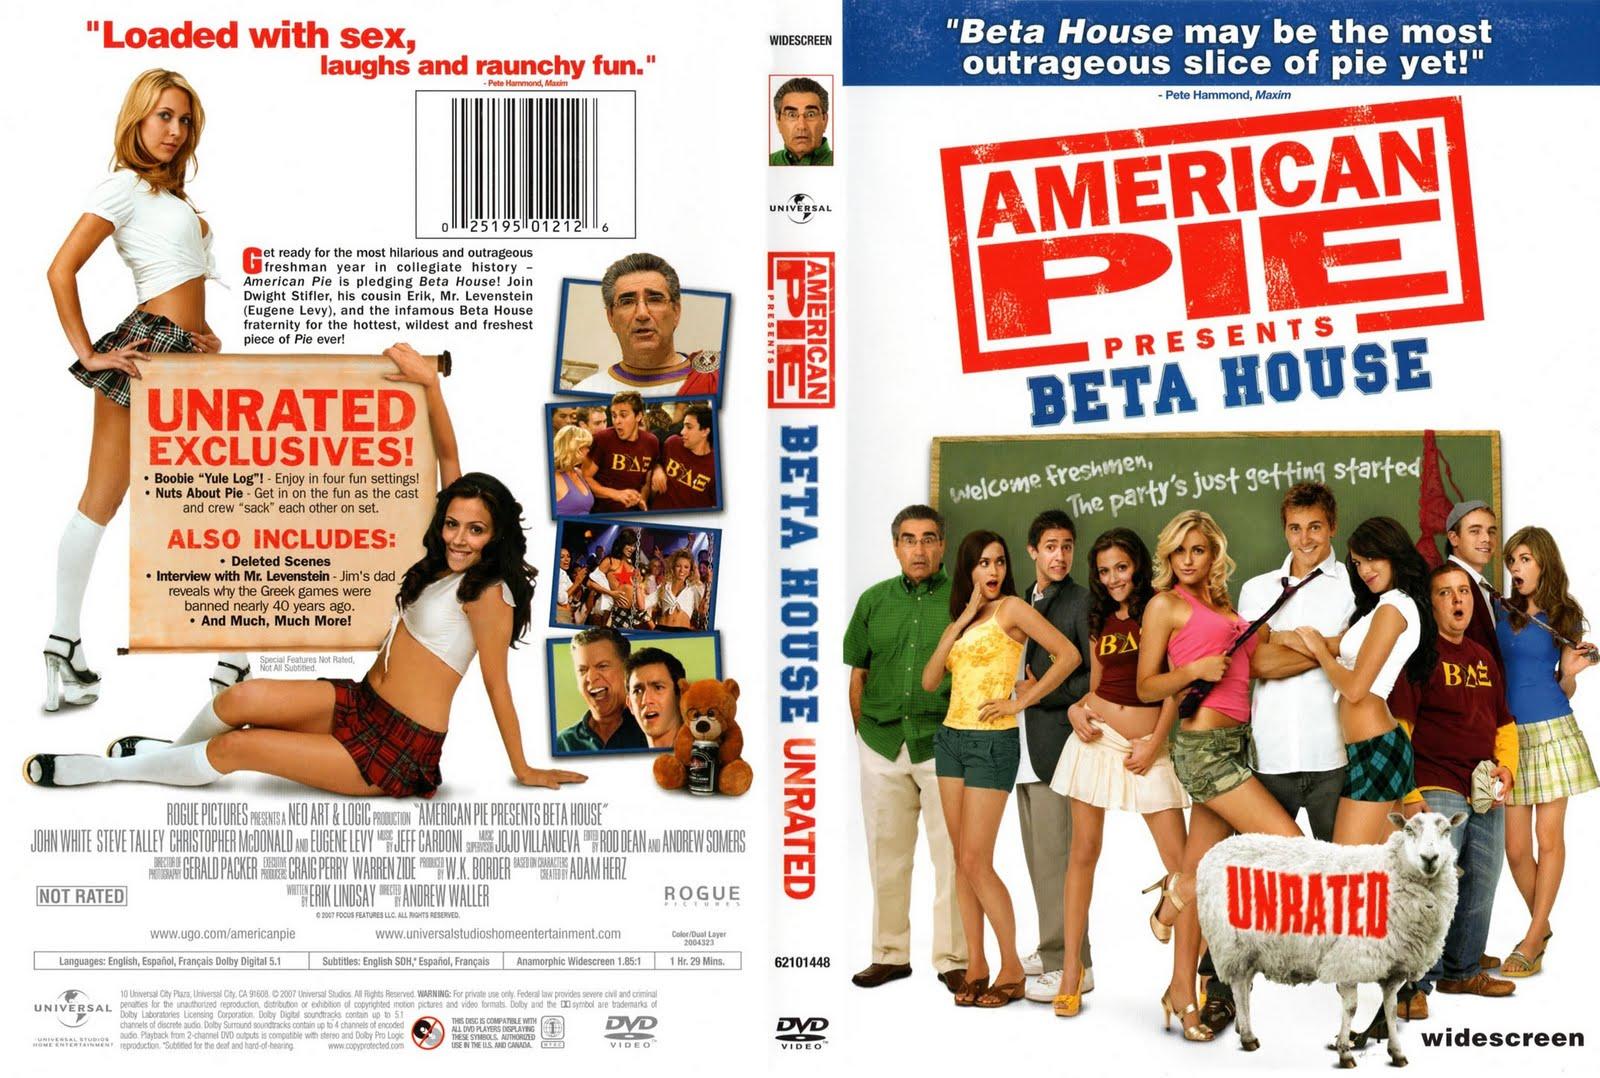 http://2.bp.blogspot.com/_WkKZJVG5wTk/TPDVp2tEB0I/AAAAAAACx_k/sTC9zCHG-Sg/s1600/American_Pie_Beta_House.jpg